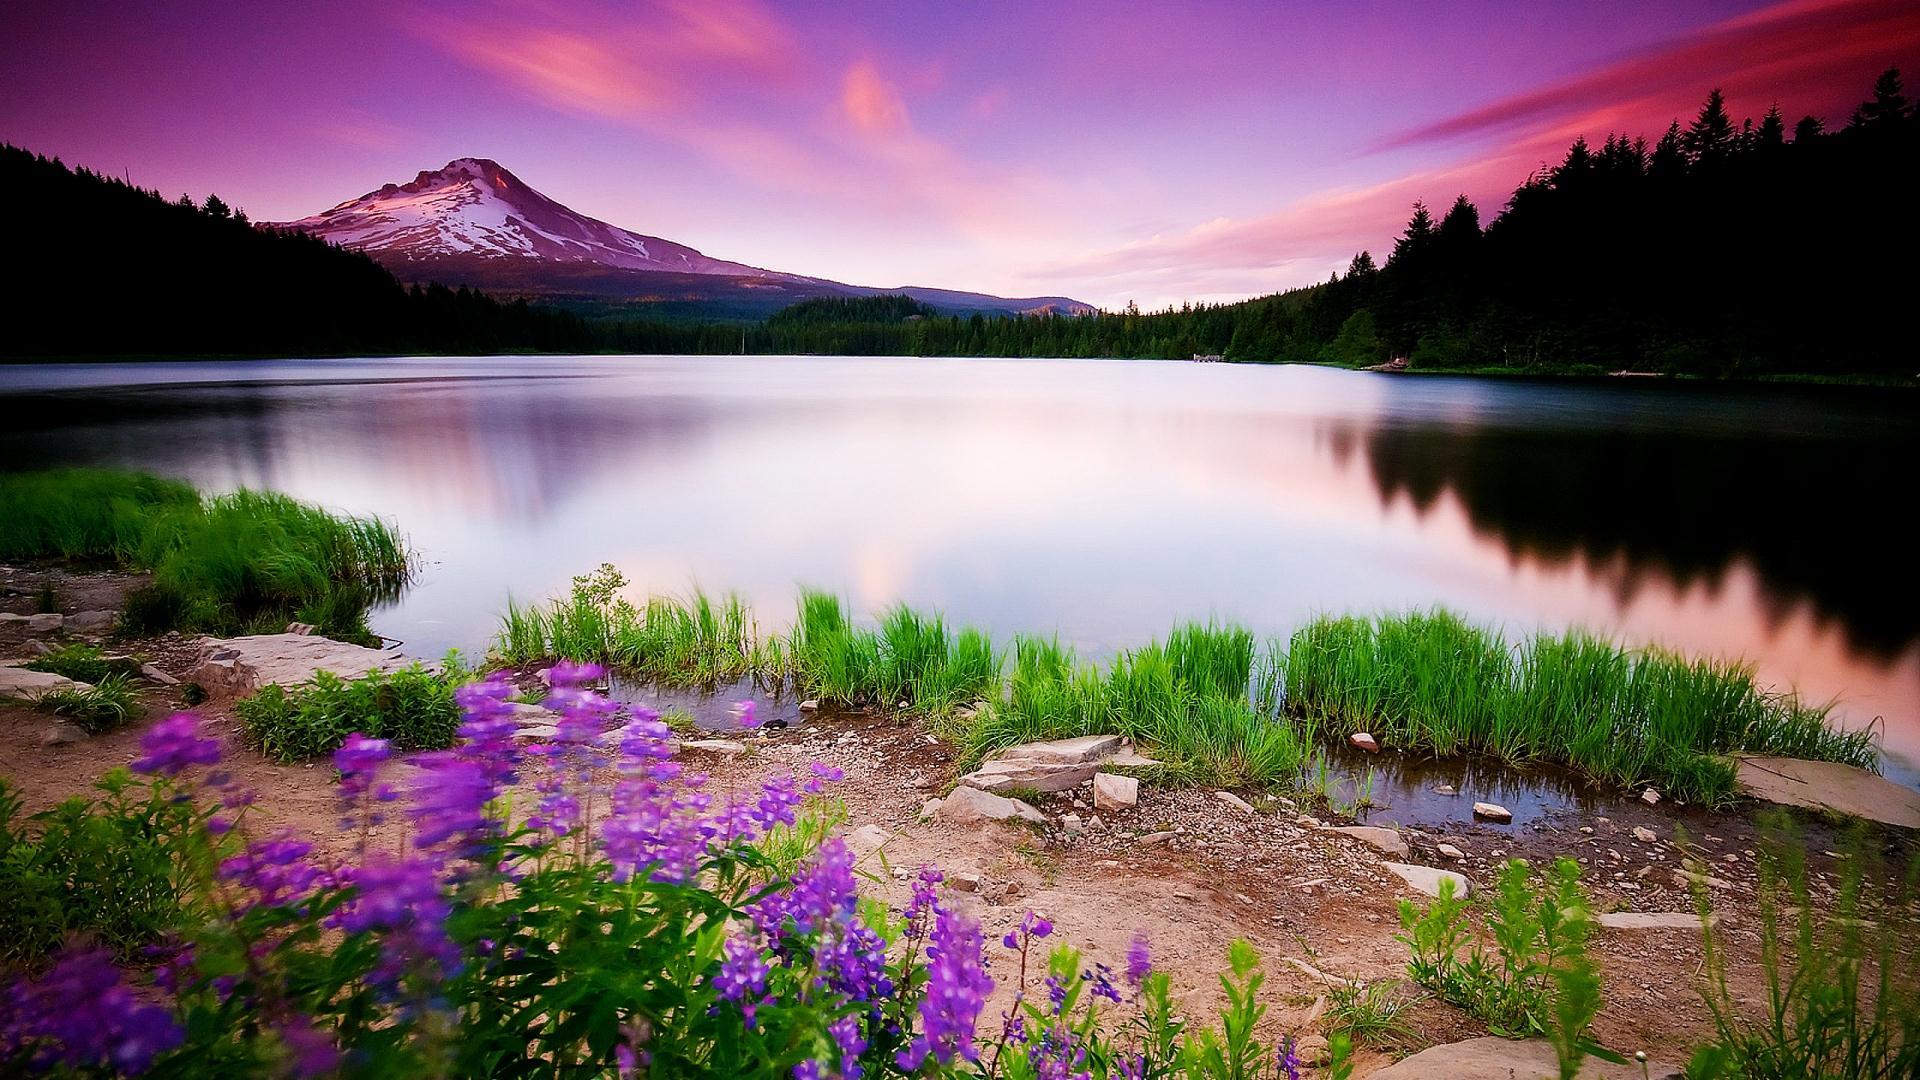 Nature Backgrounds Photoshop Editing Natural Photos Wall Nature Hd